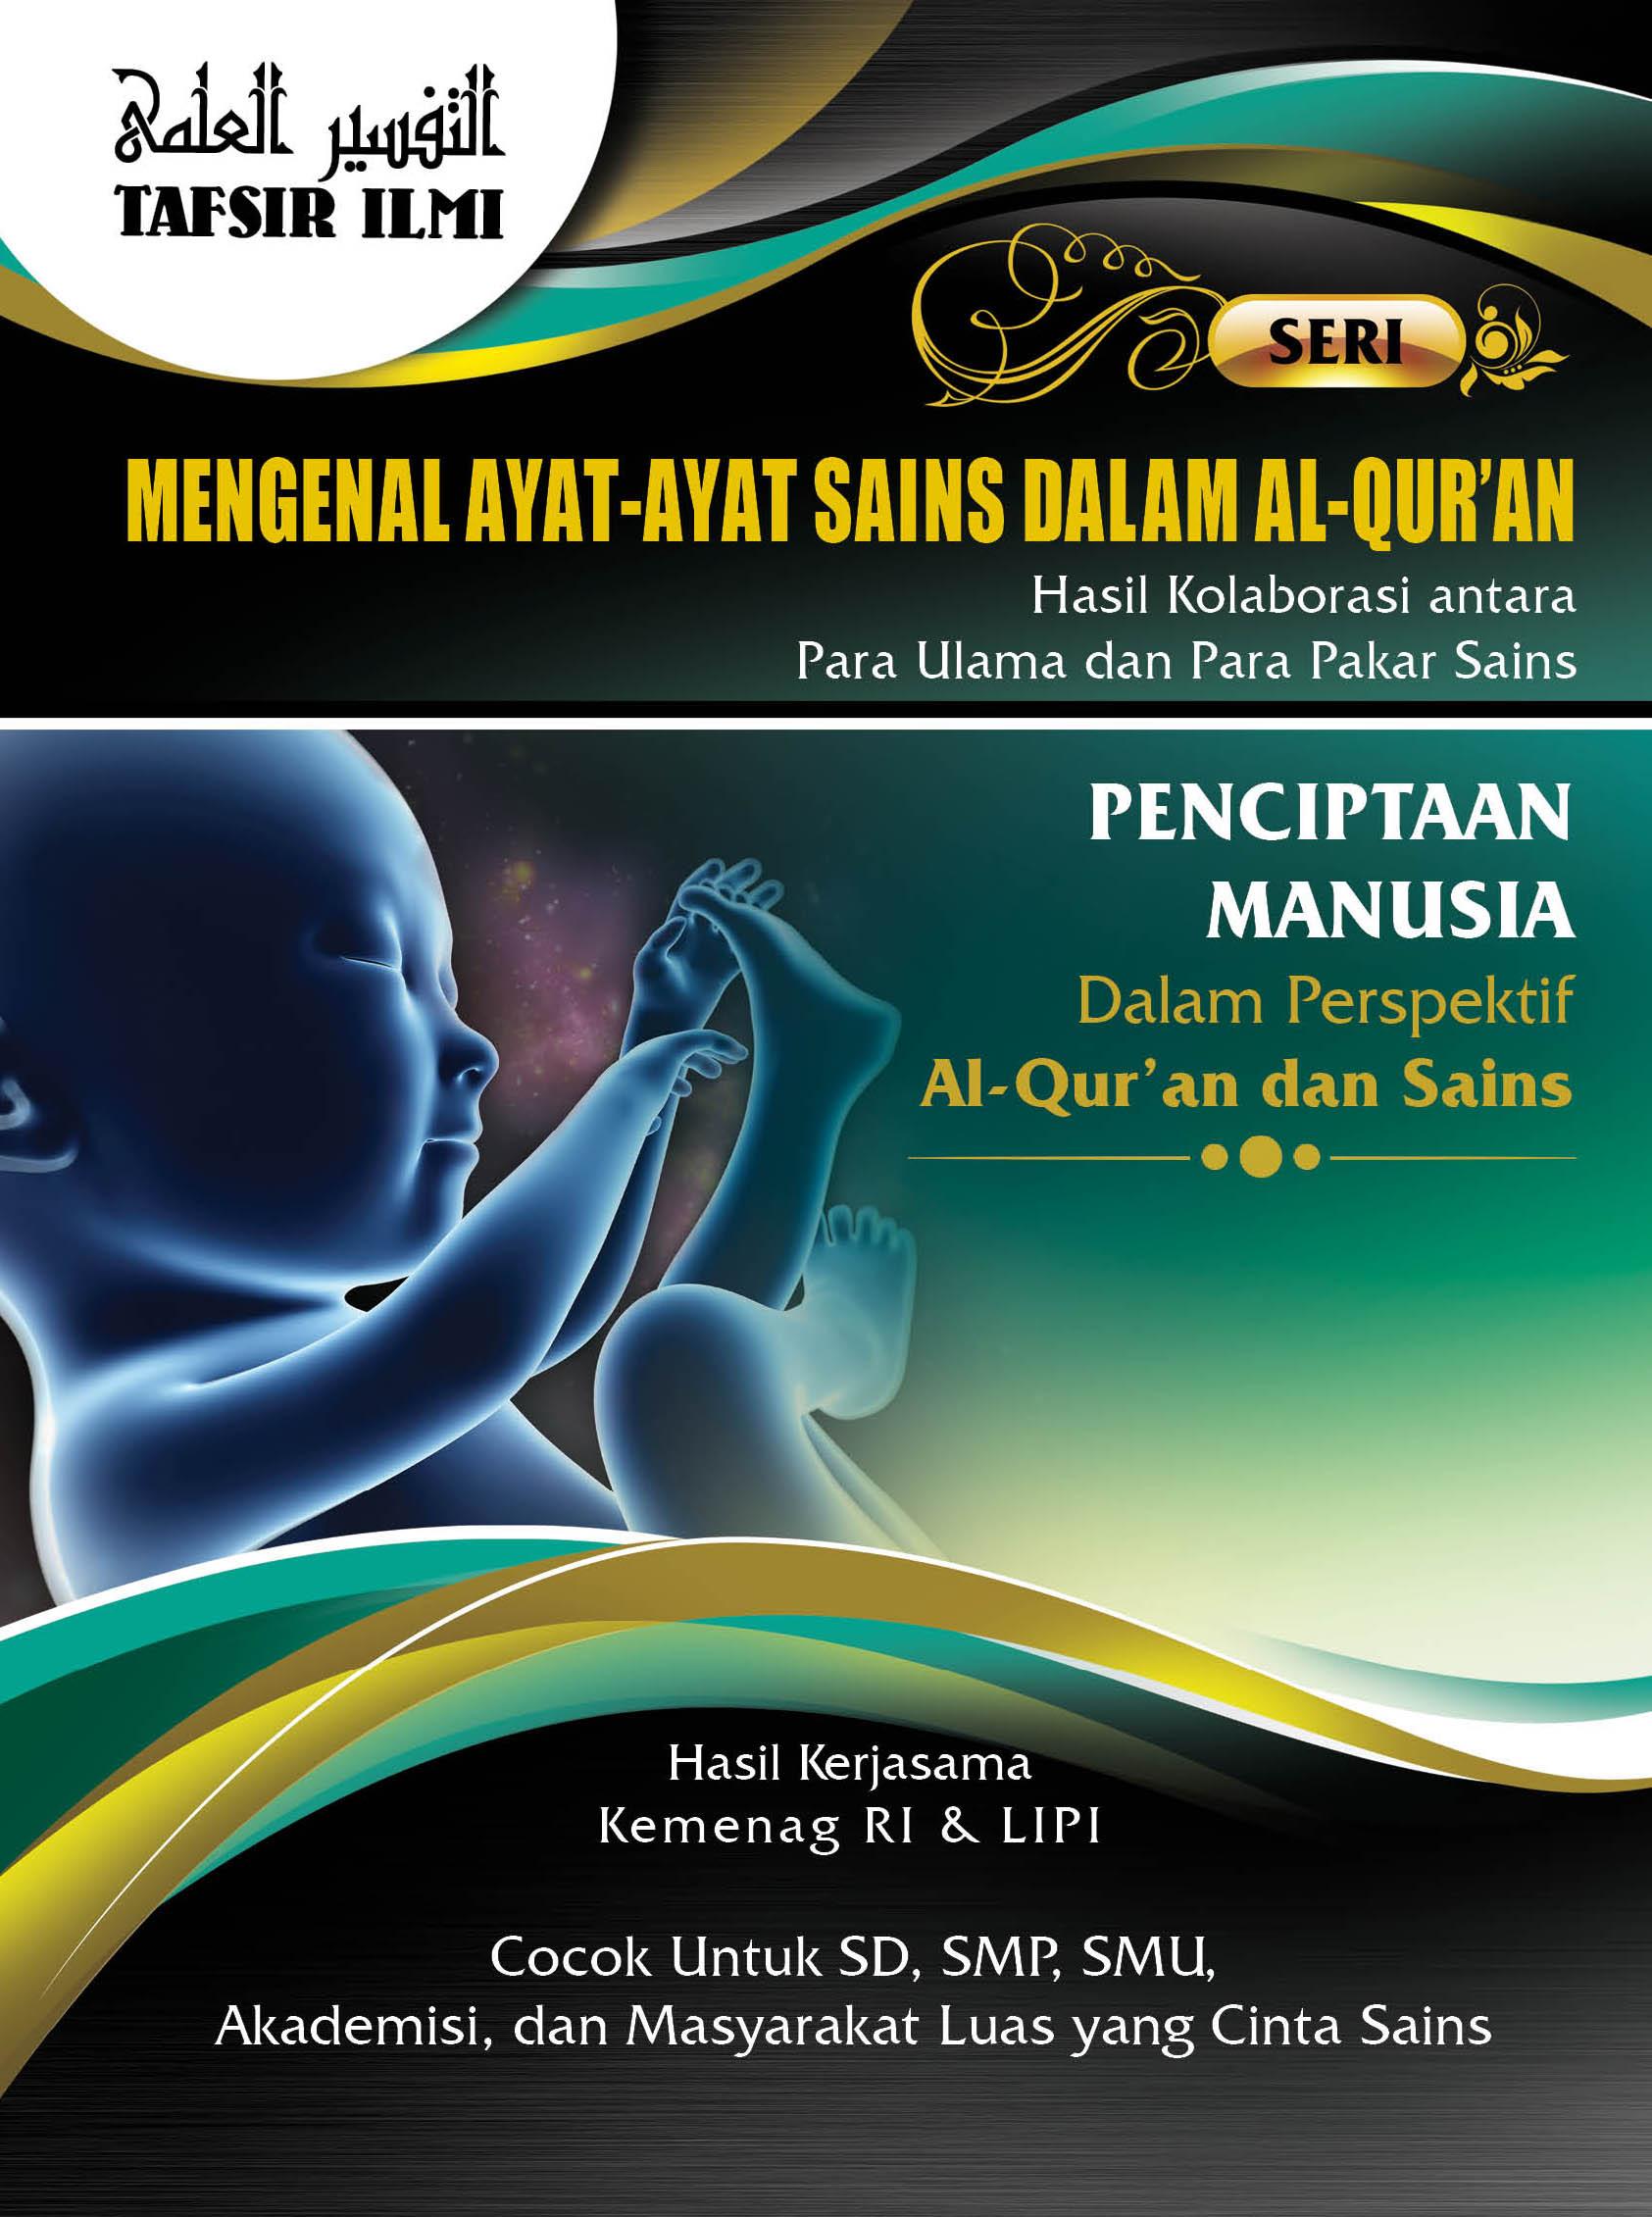 Kover Ensiklopedi Tafsir Ilmi Mengenal Sains dalam Al-Qur'an (www.ensiklopediaalquran.com)